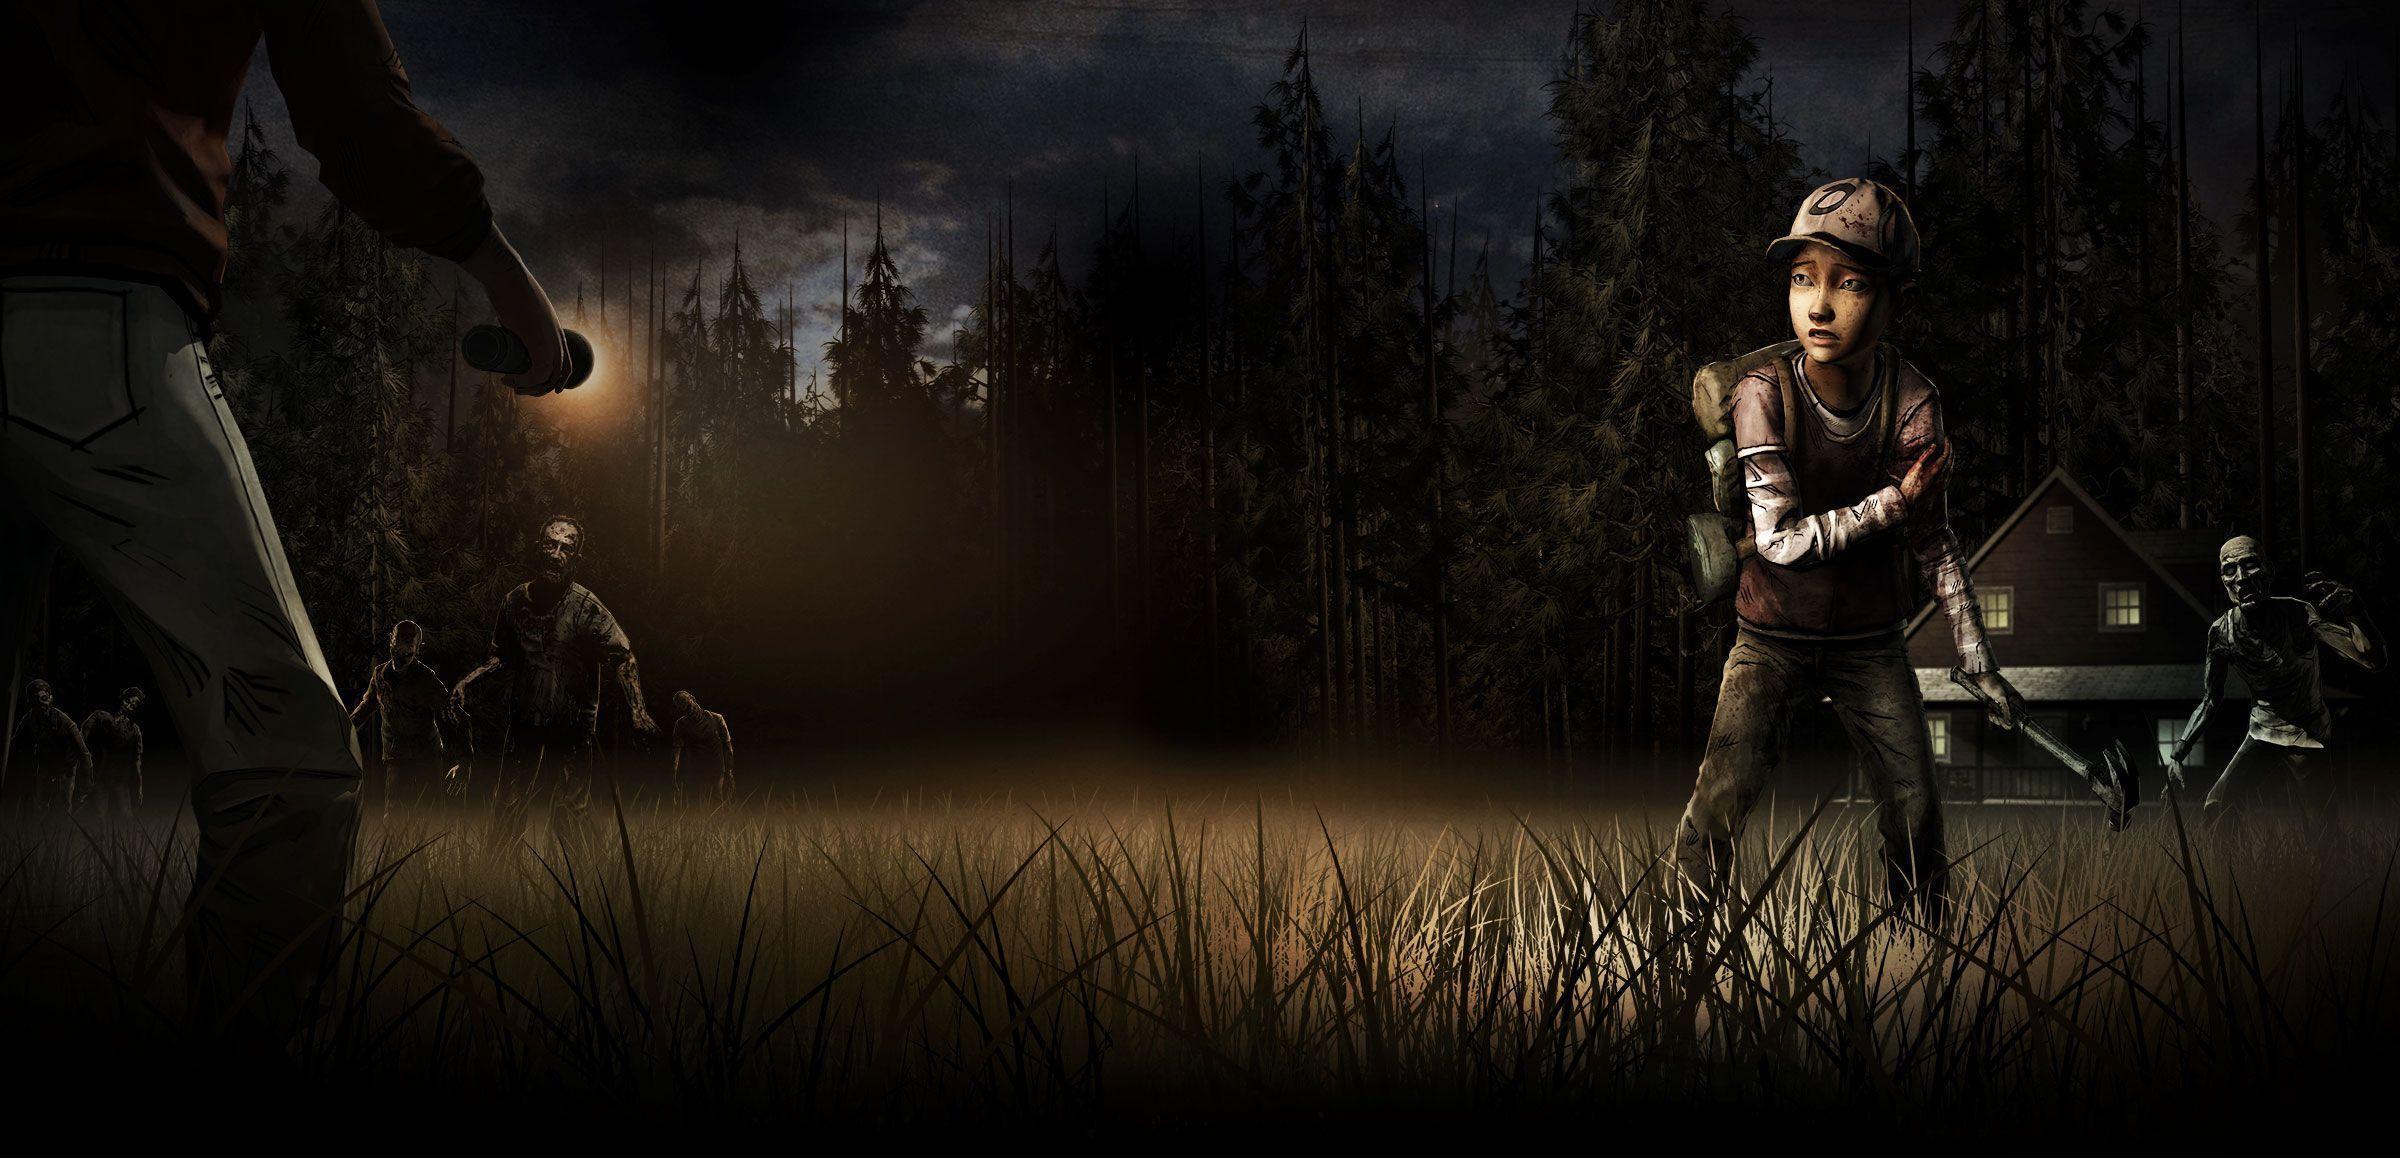 The Walking Dead Temporada 6 Cartel Fondos Fondos De: The Walking Dead Game Wallpapers